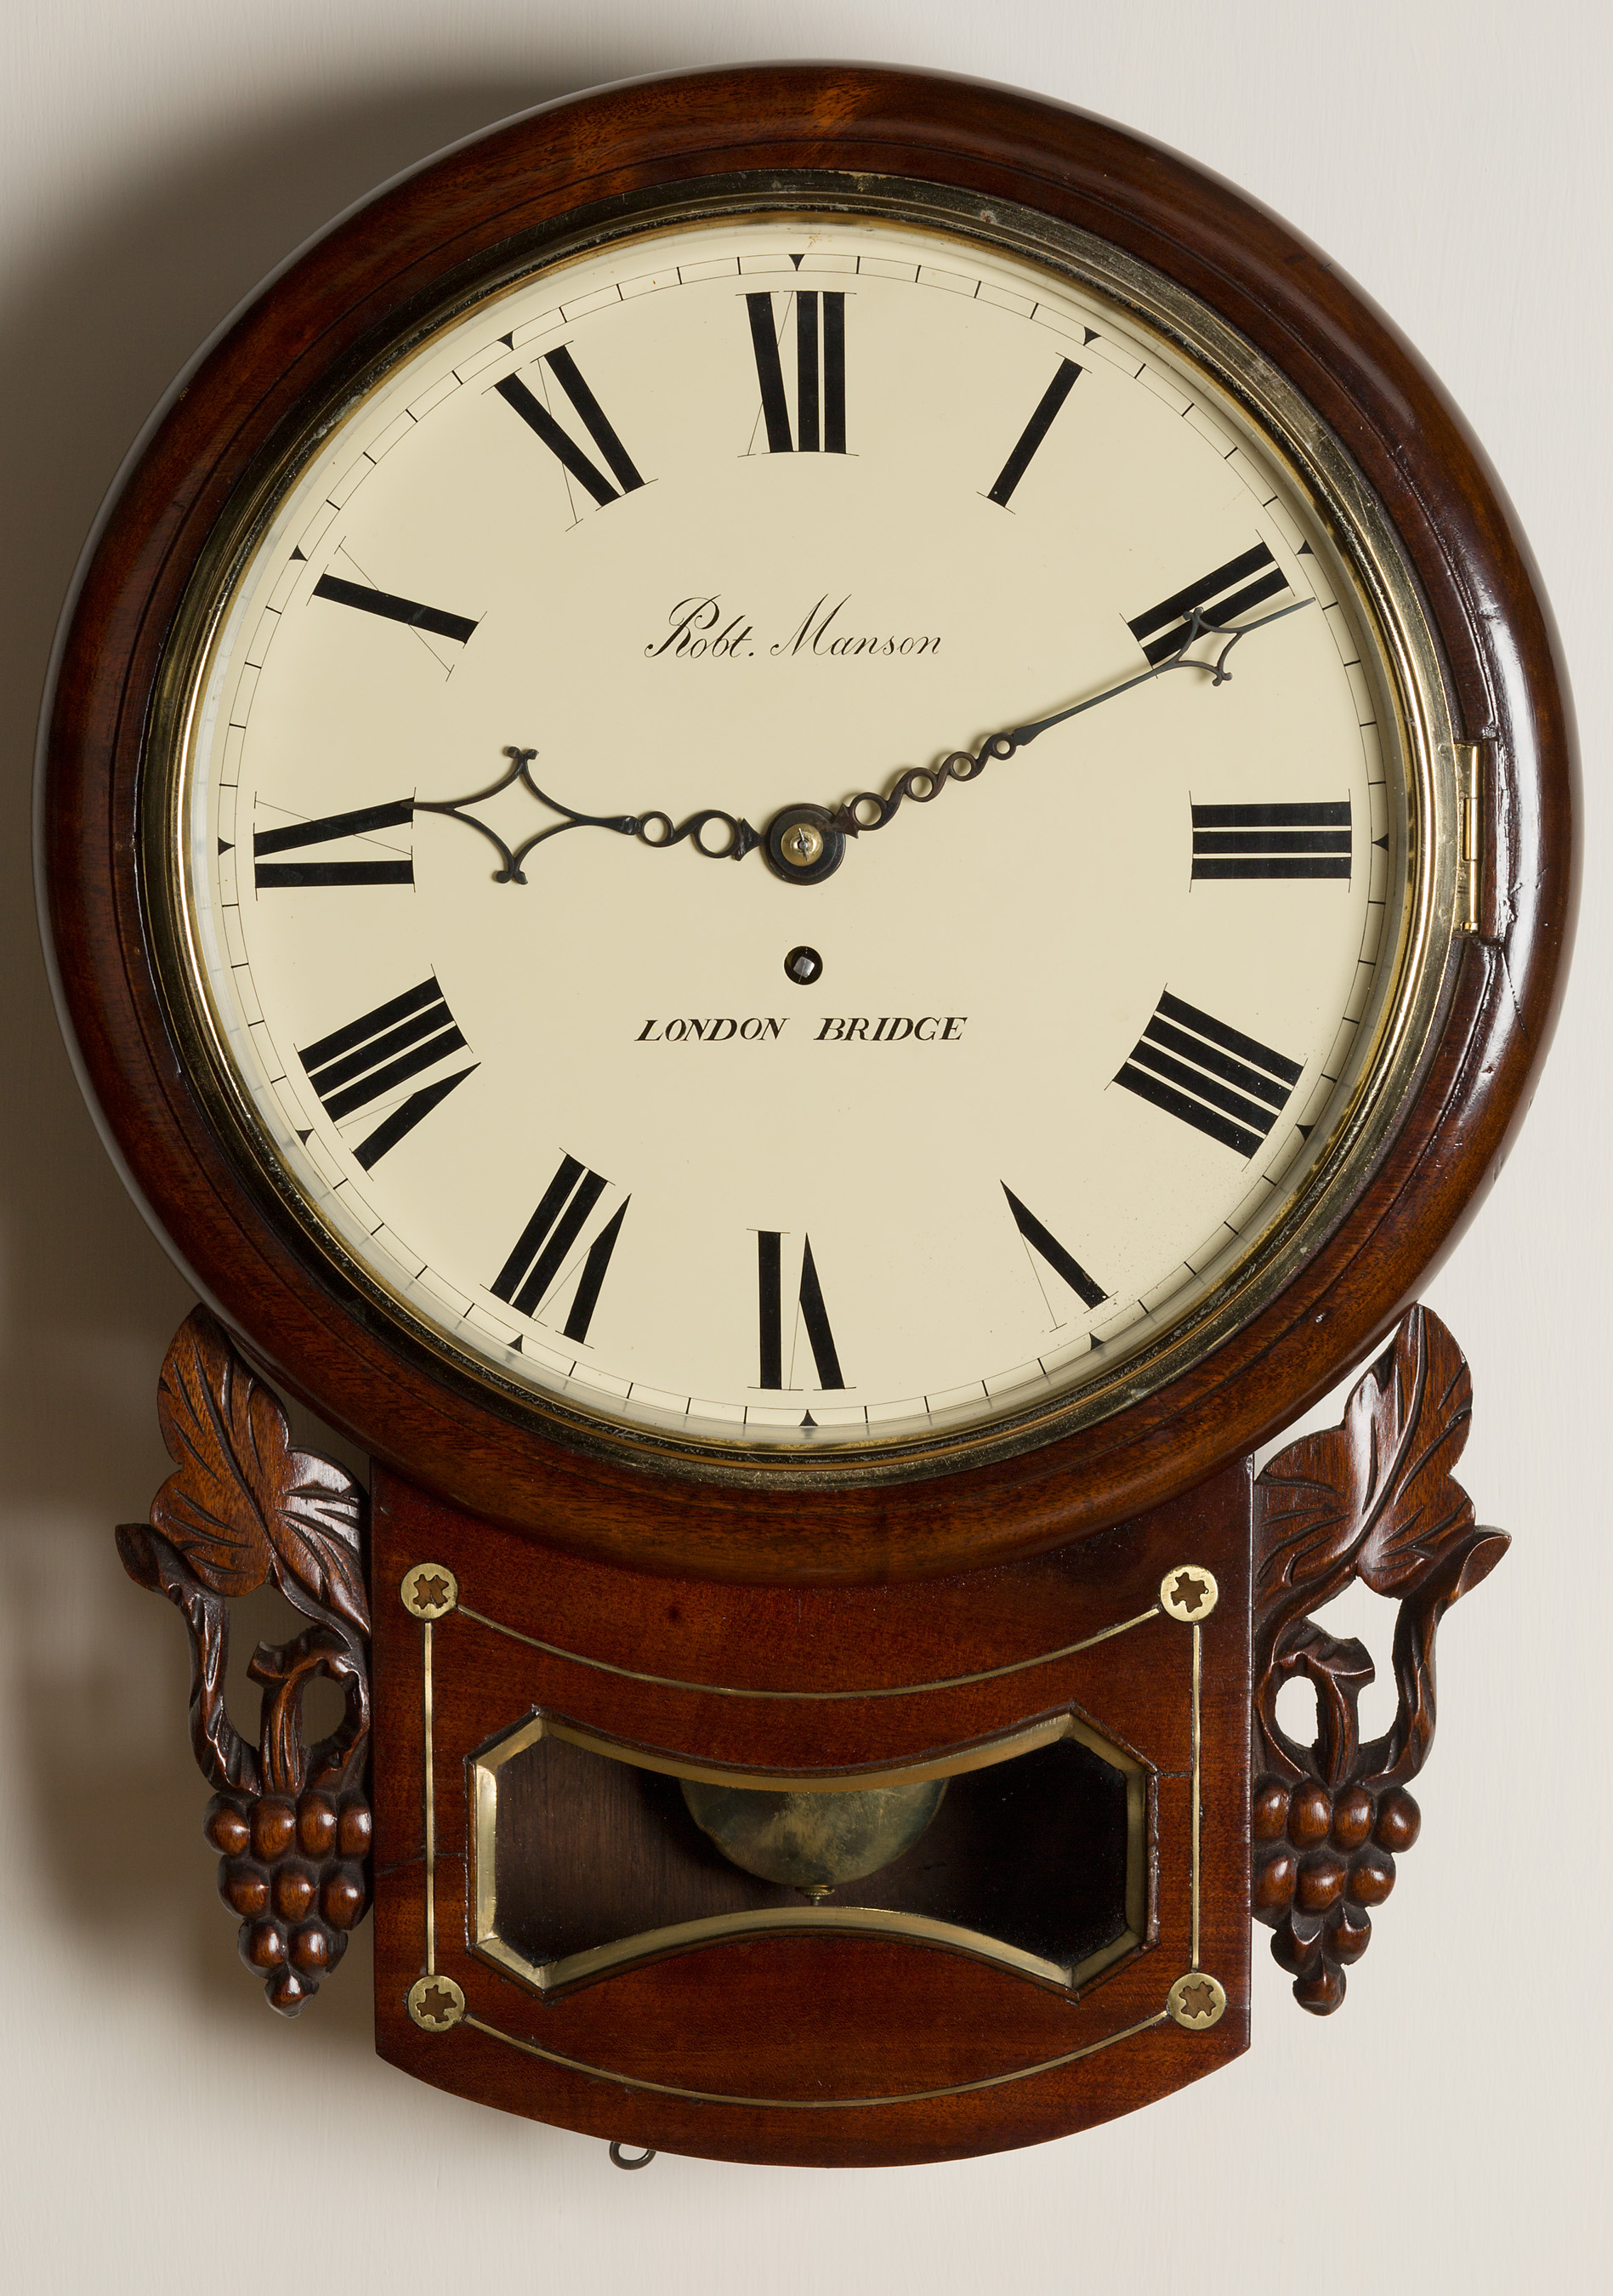 Victorian Drop Dial Clock By Manson London Bridge Olde